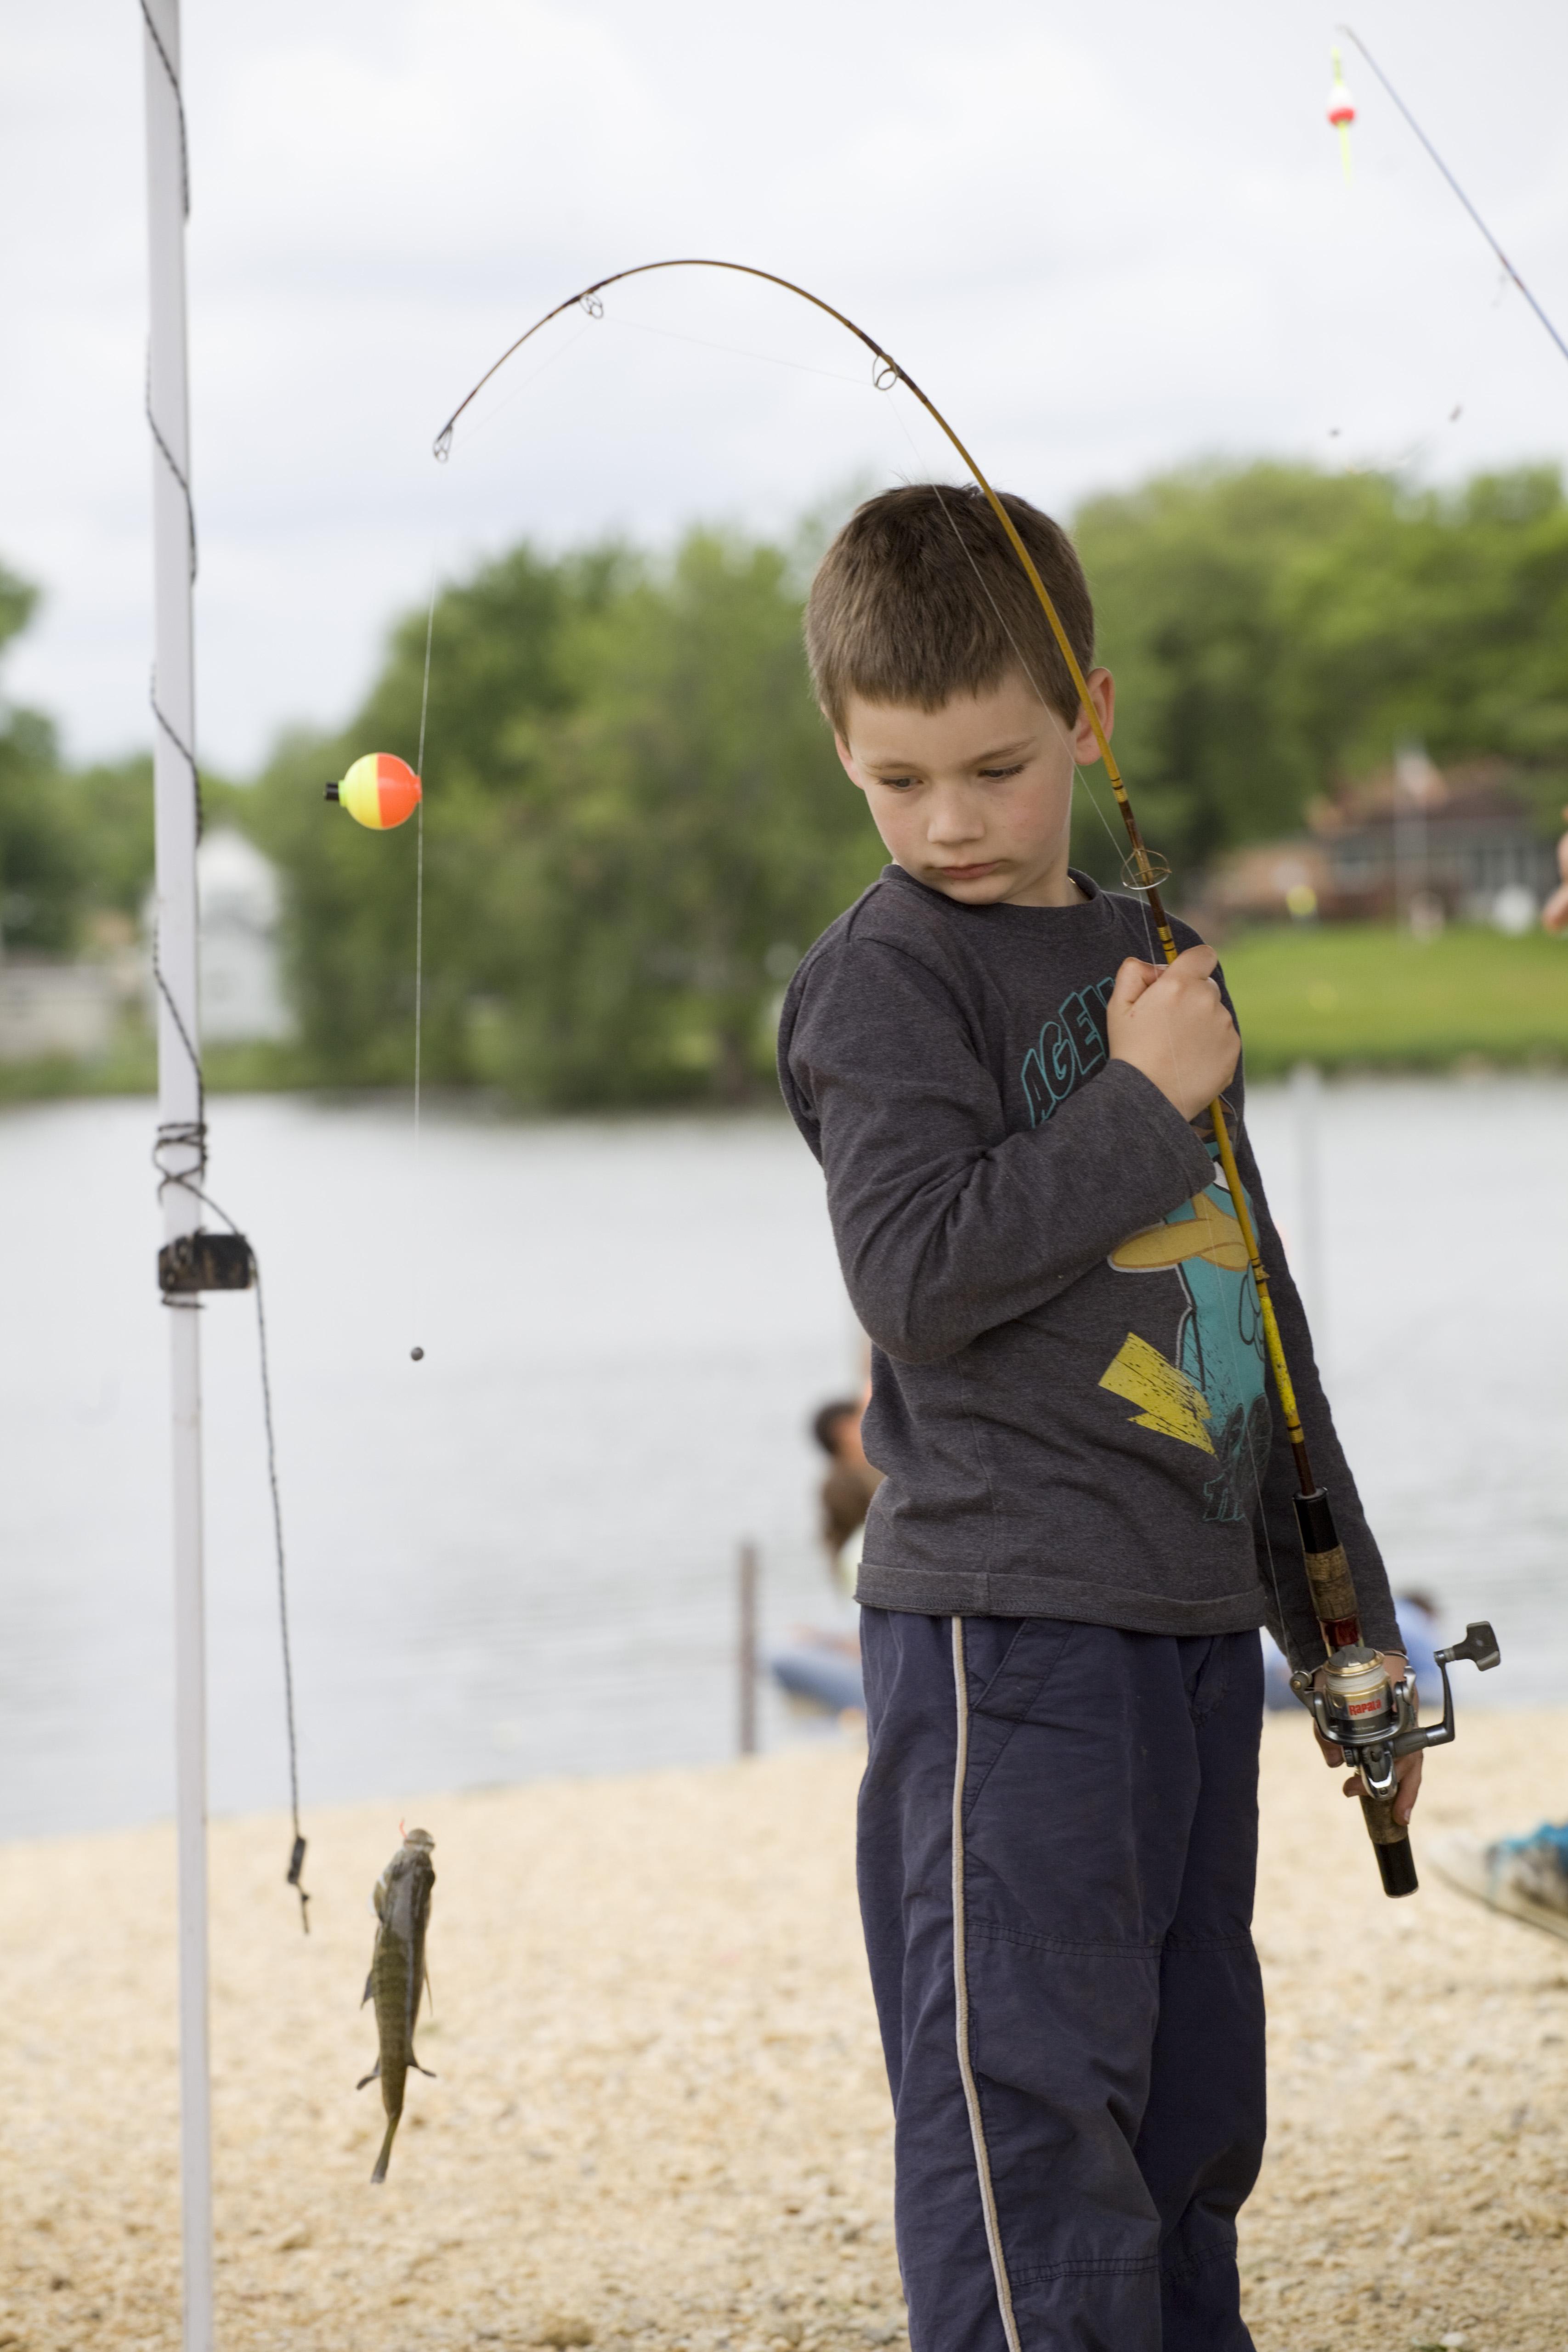 fishing_kid_mg_0291